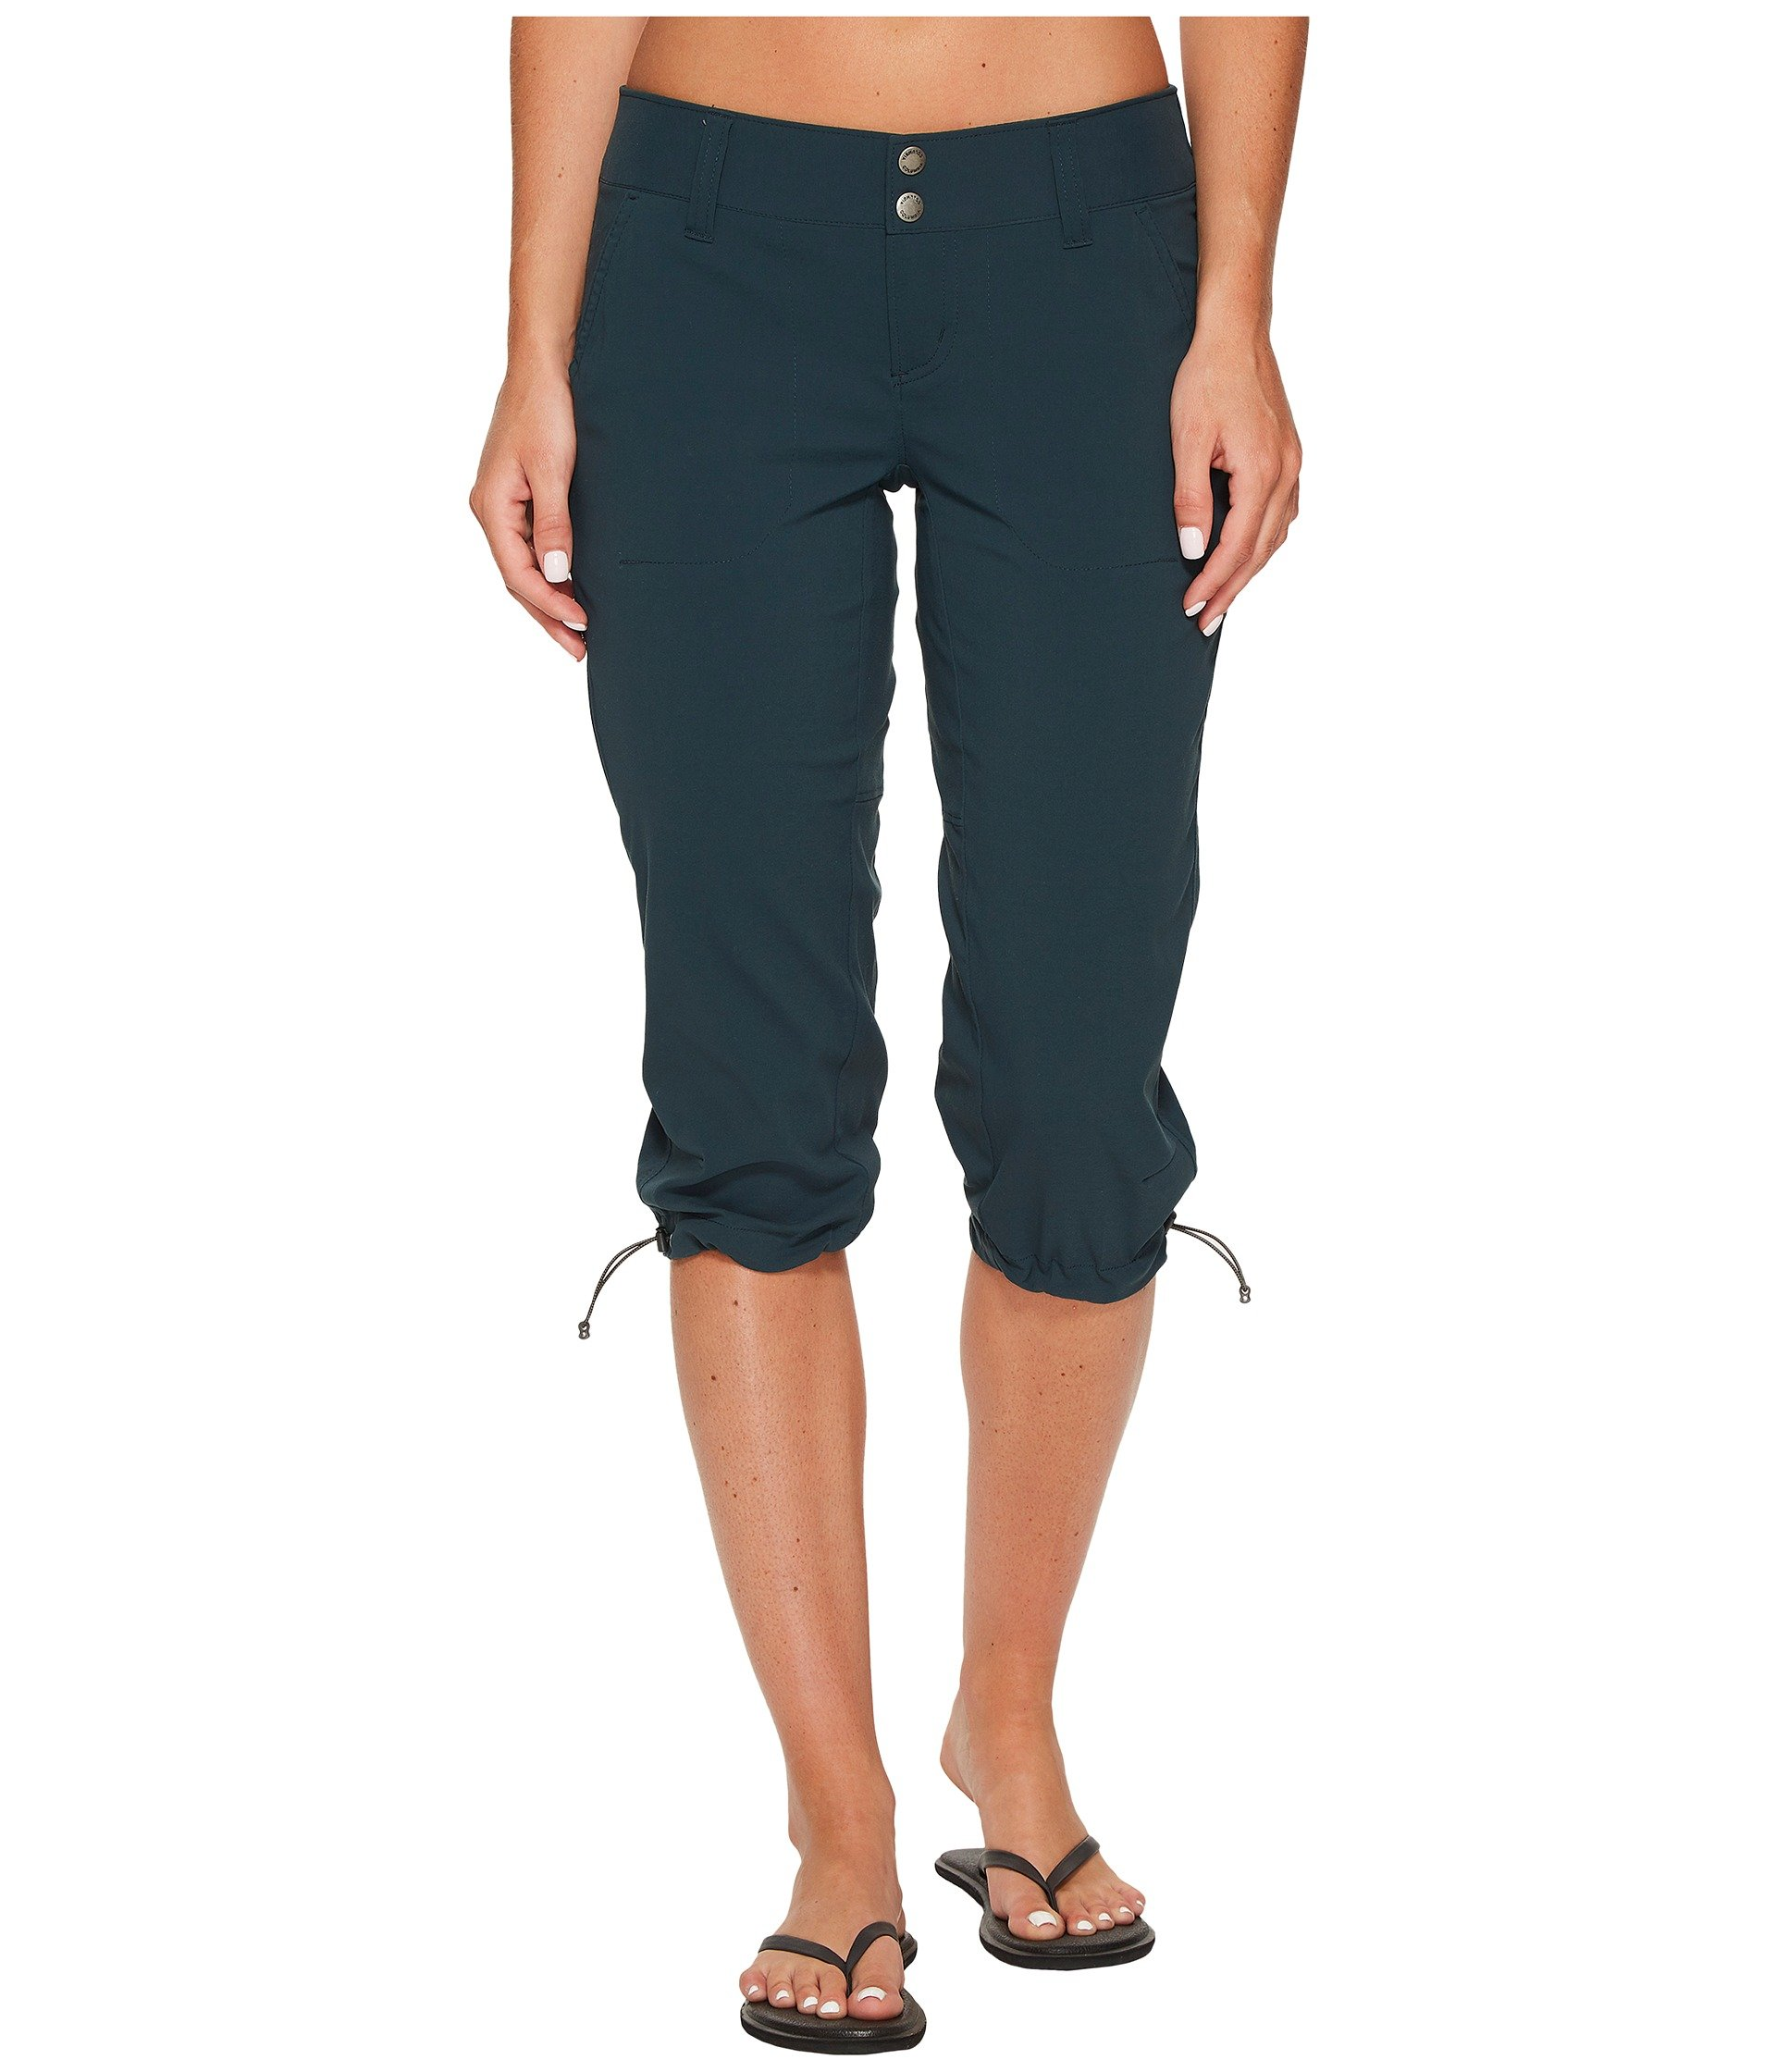 Columbia Women's Saturday Trail ii Knee Pants, Night Shadow, Size 10 x 18 by Columbia